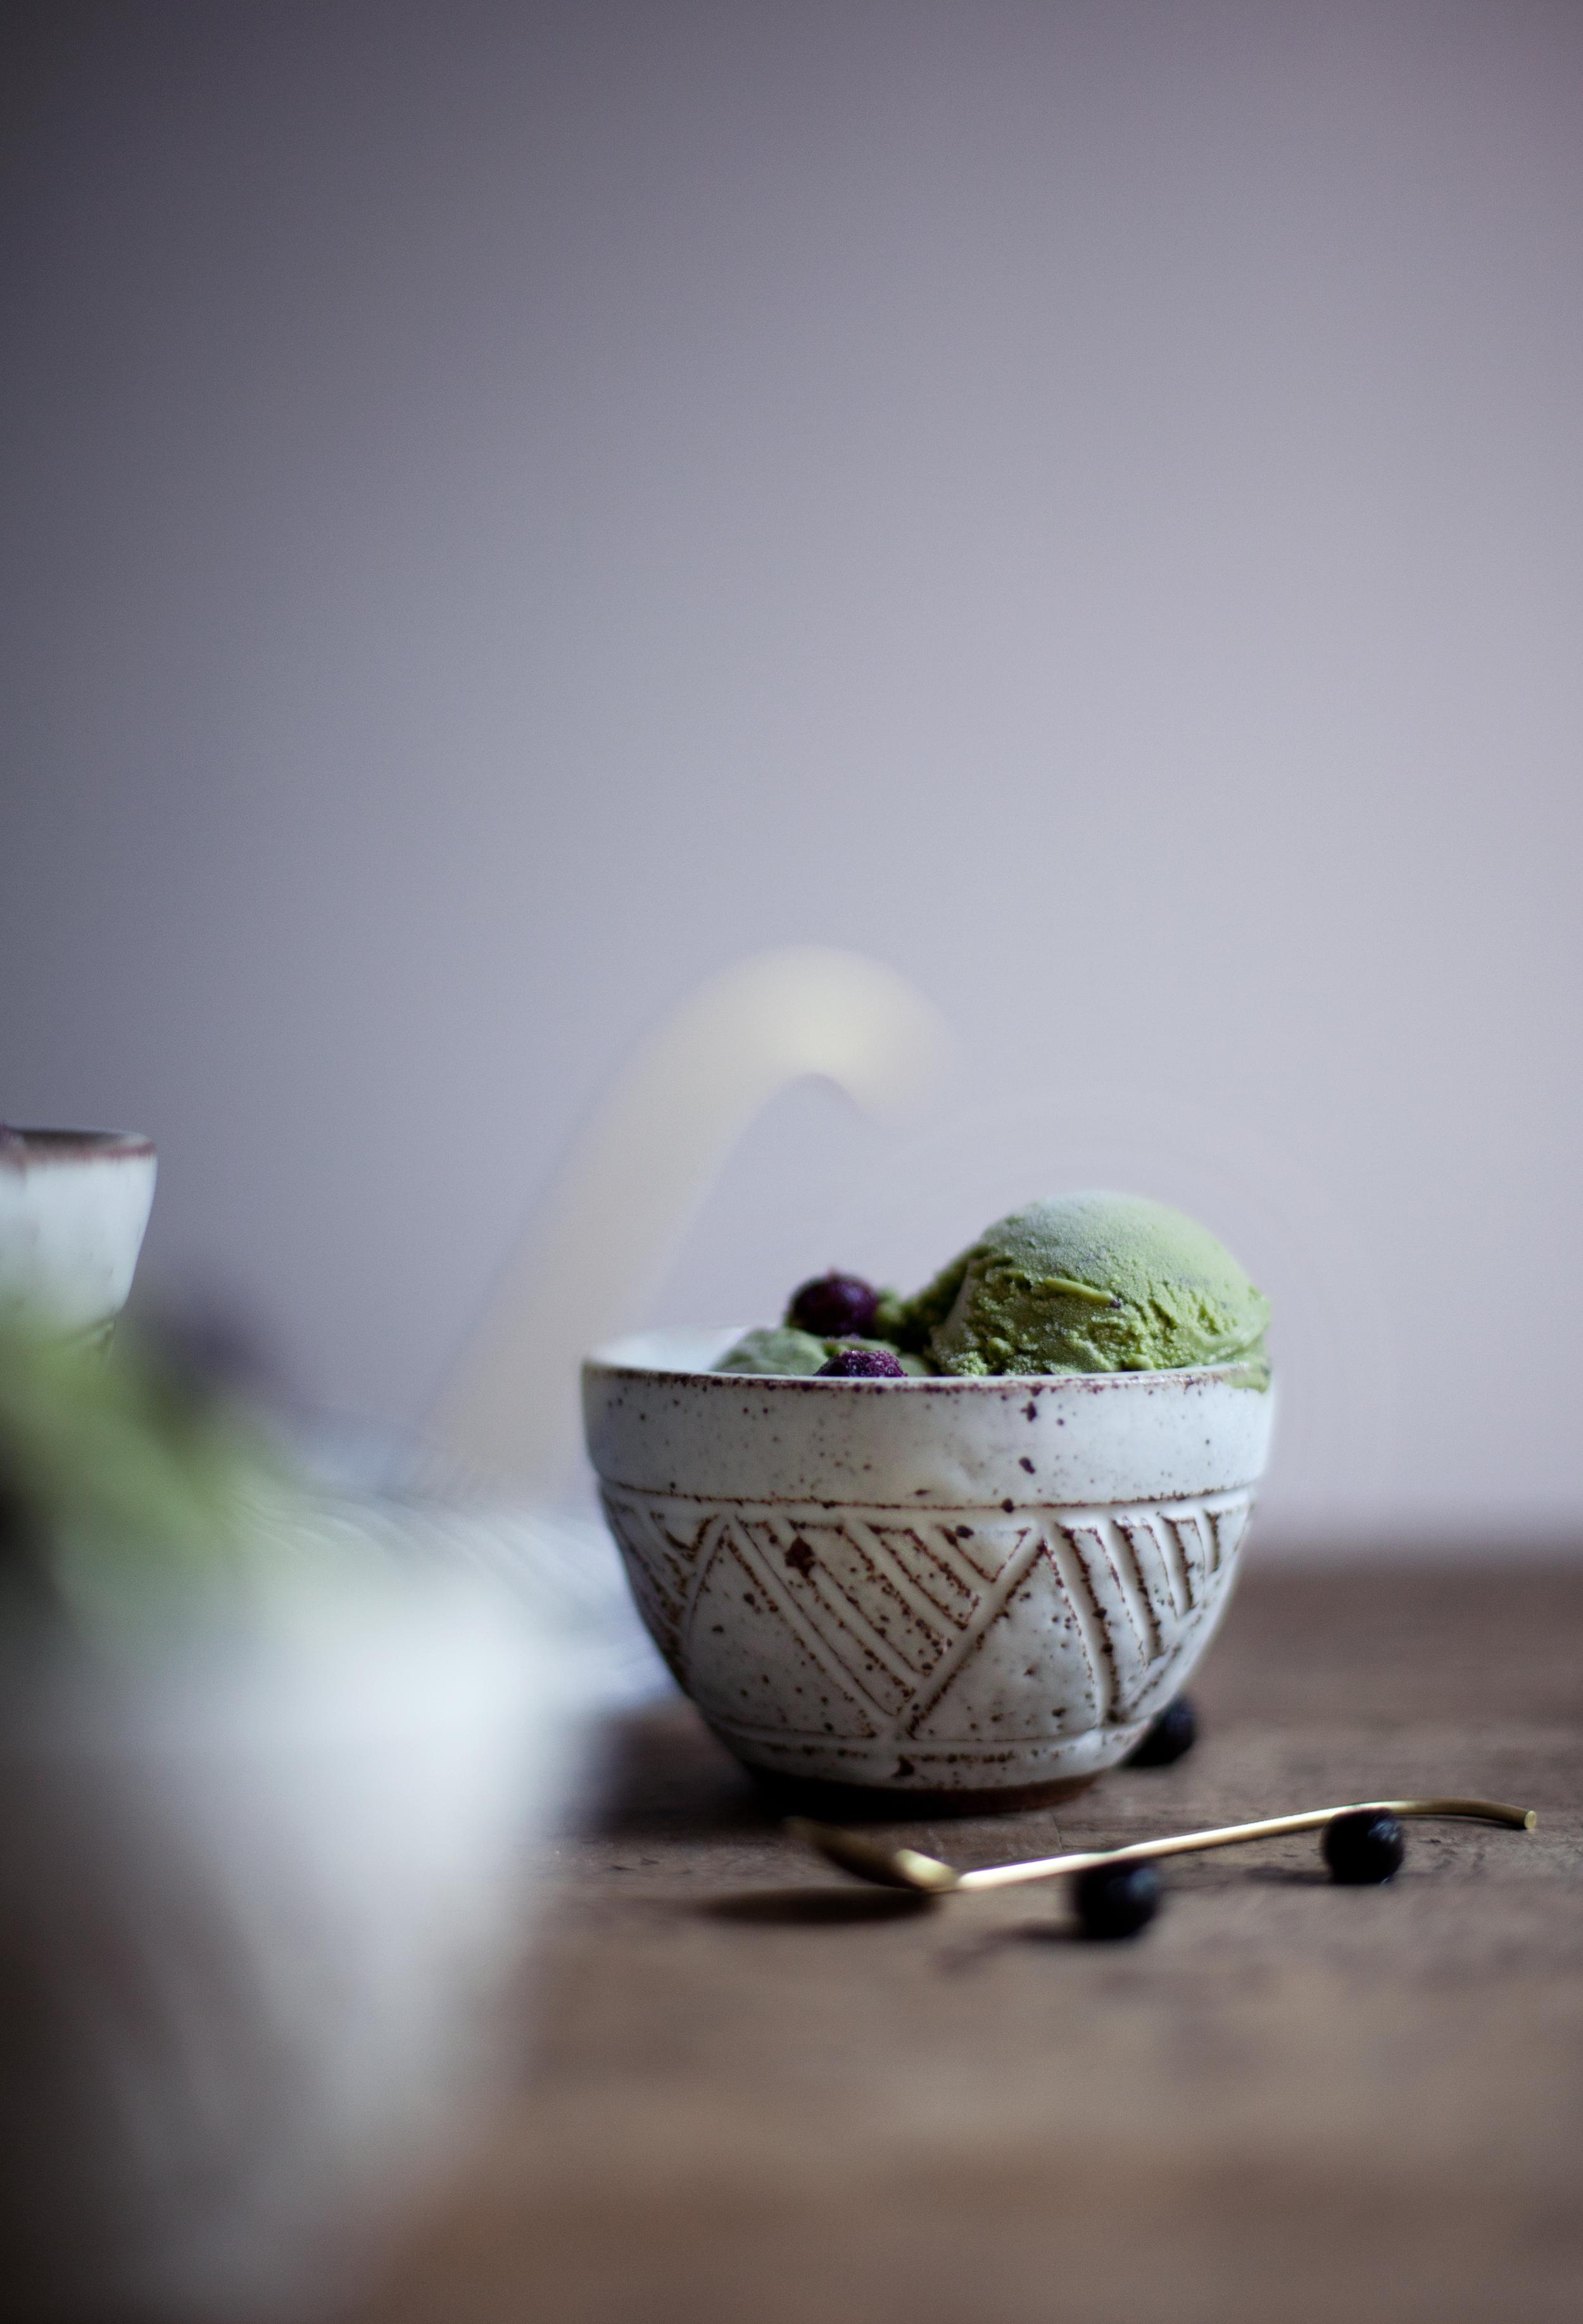 roasted blueberry green tea ice cream viiii.jpg